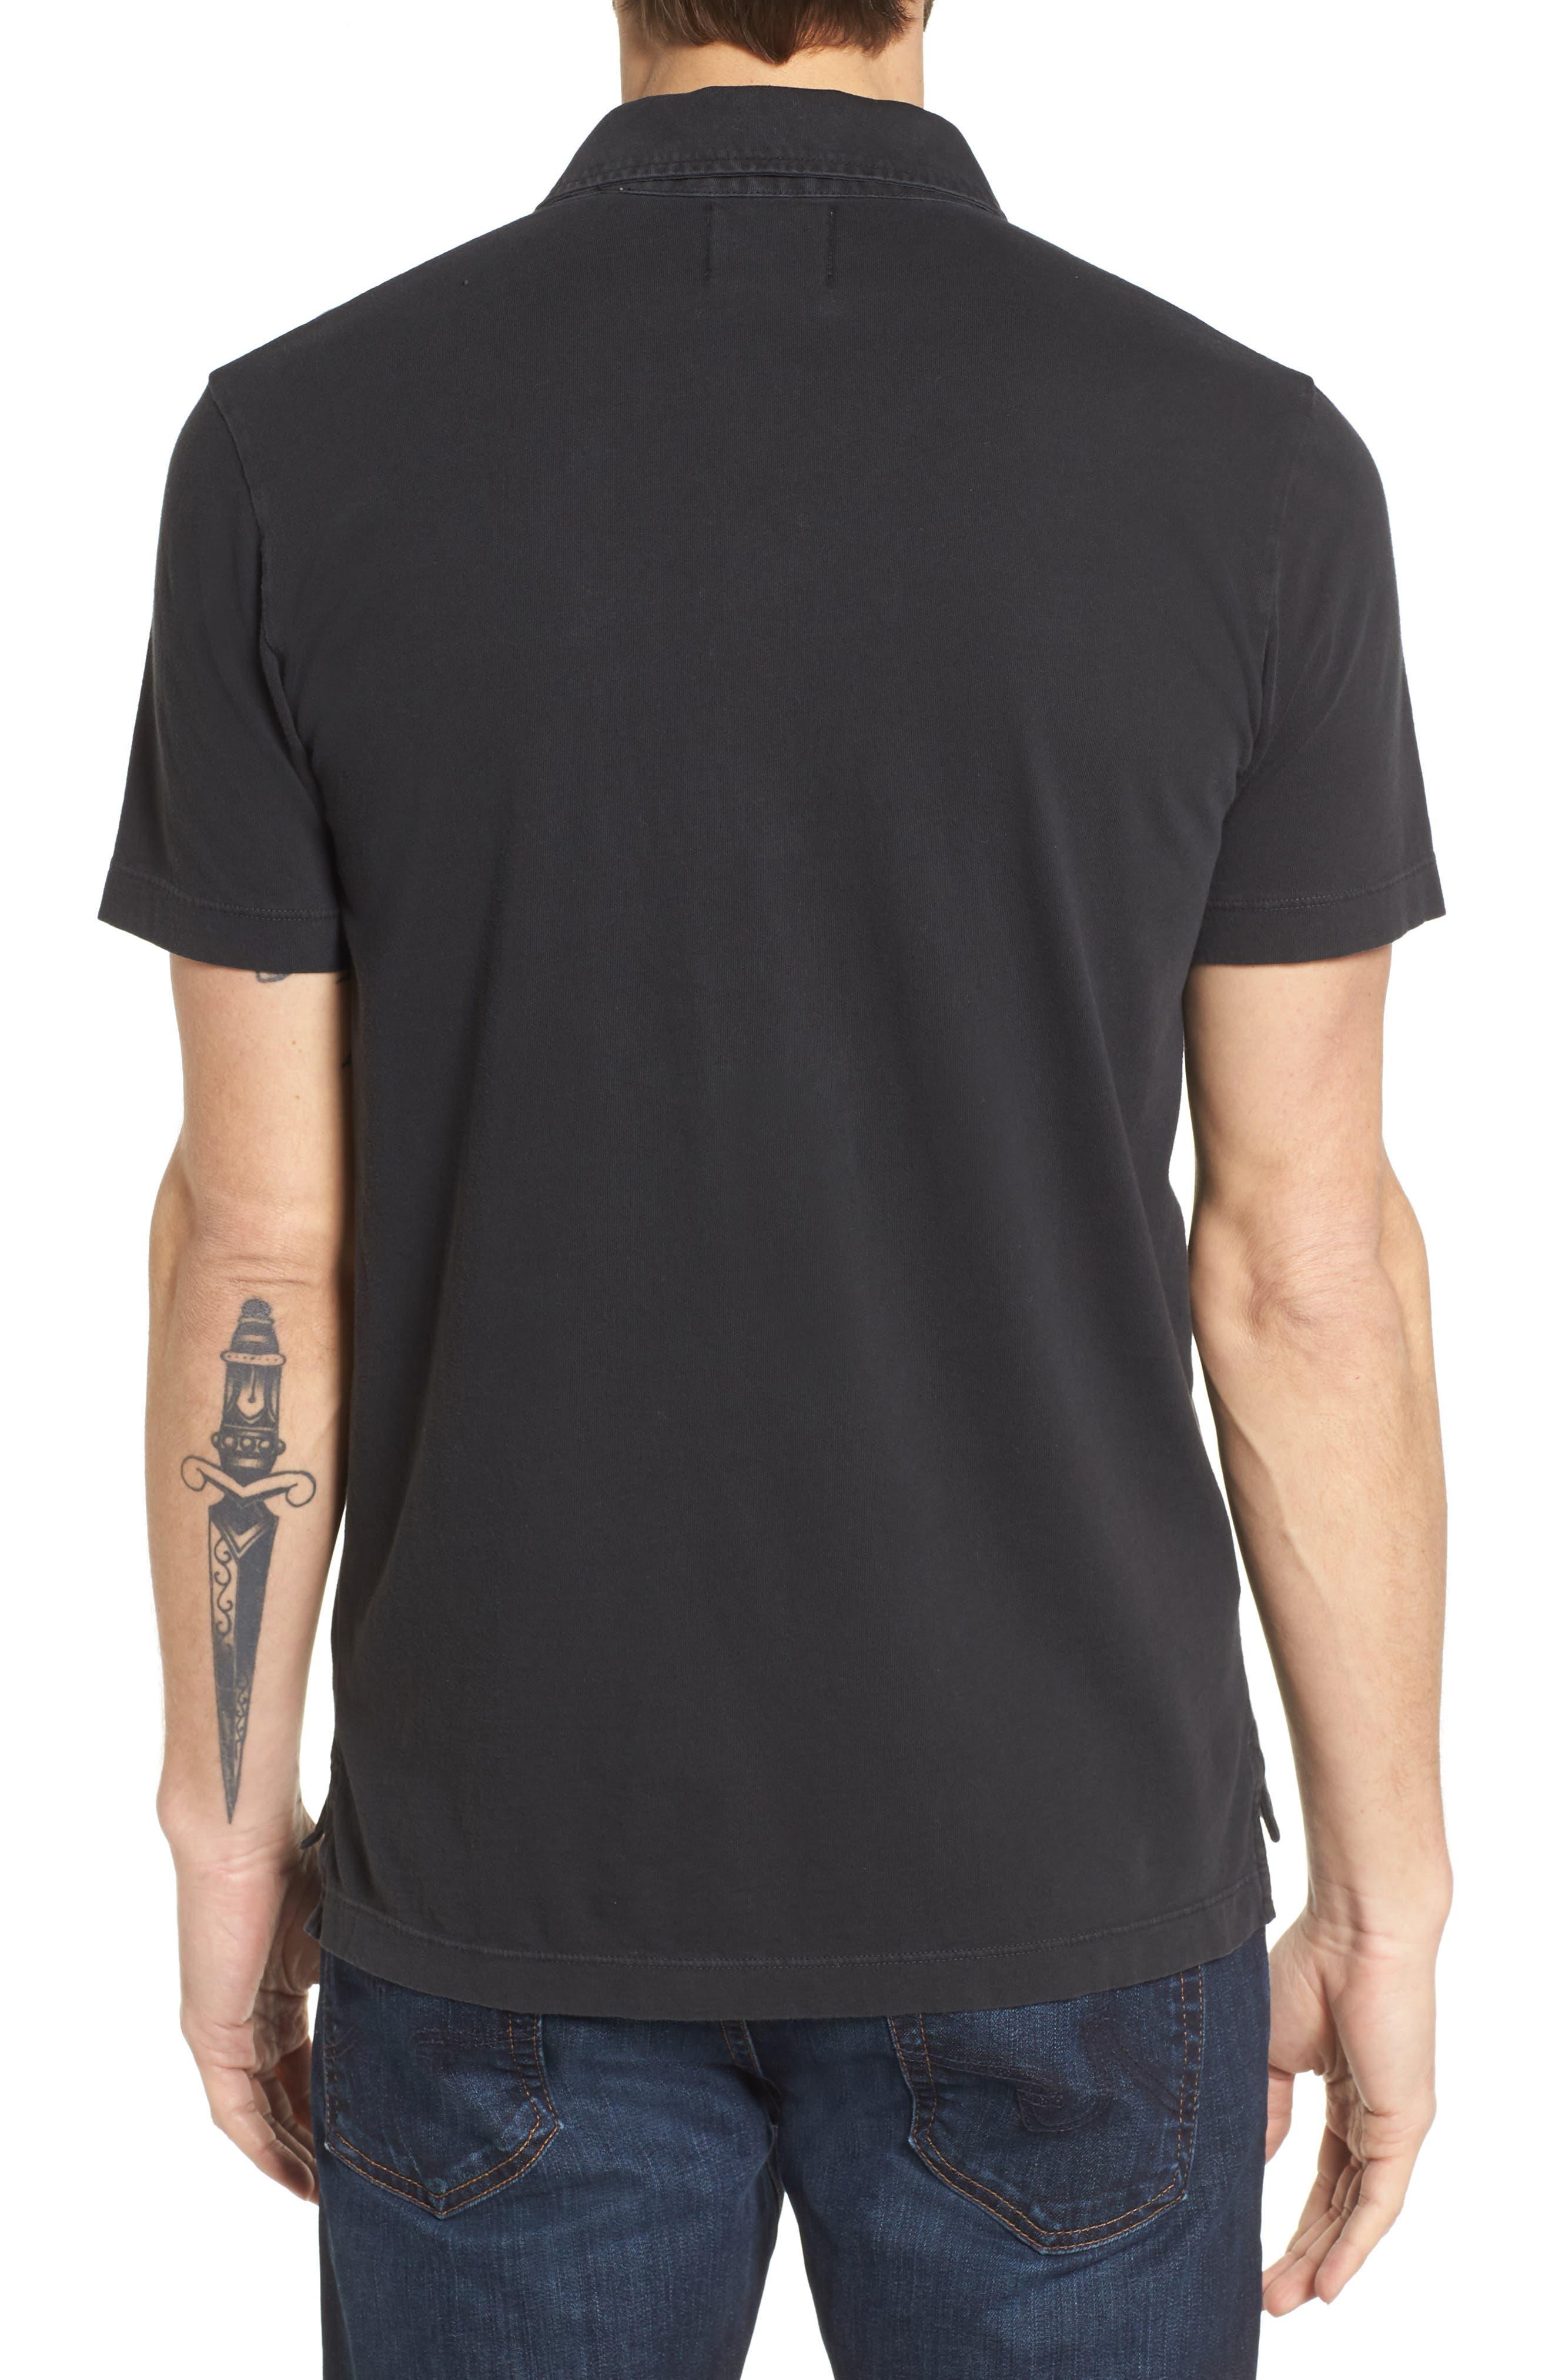 BILLY REID, Pensacola Slim Fit Garment Dye Polo, Alternate thumbnail 2, color, BLACK